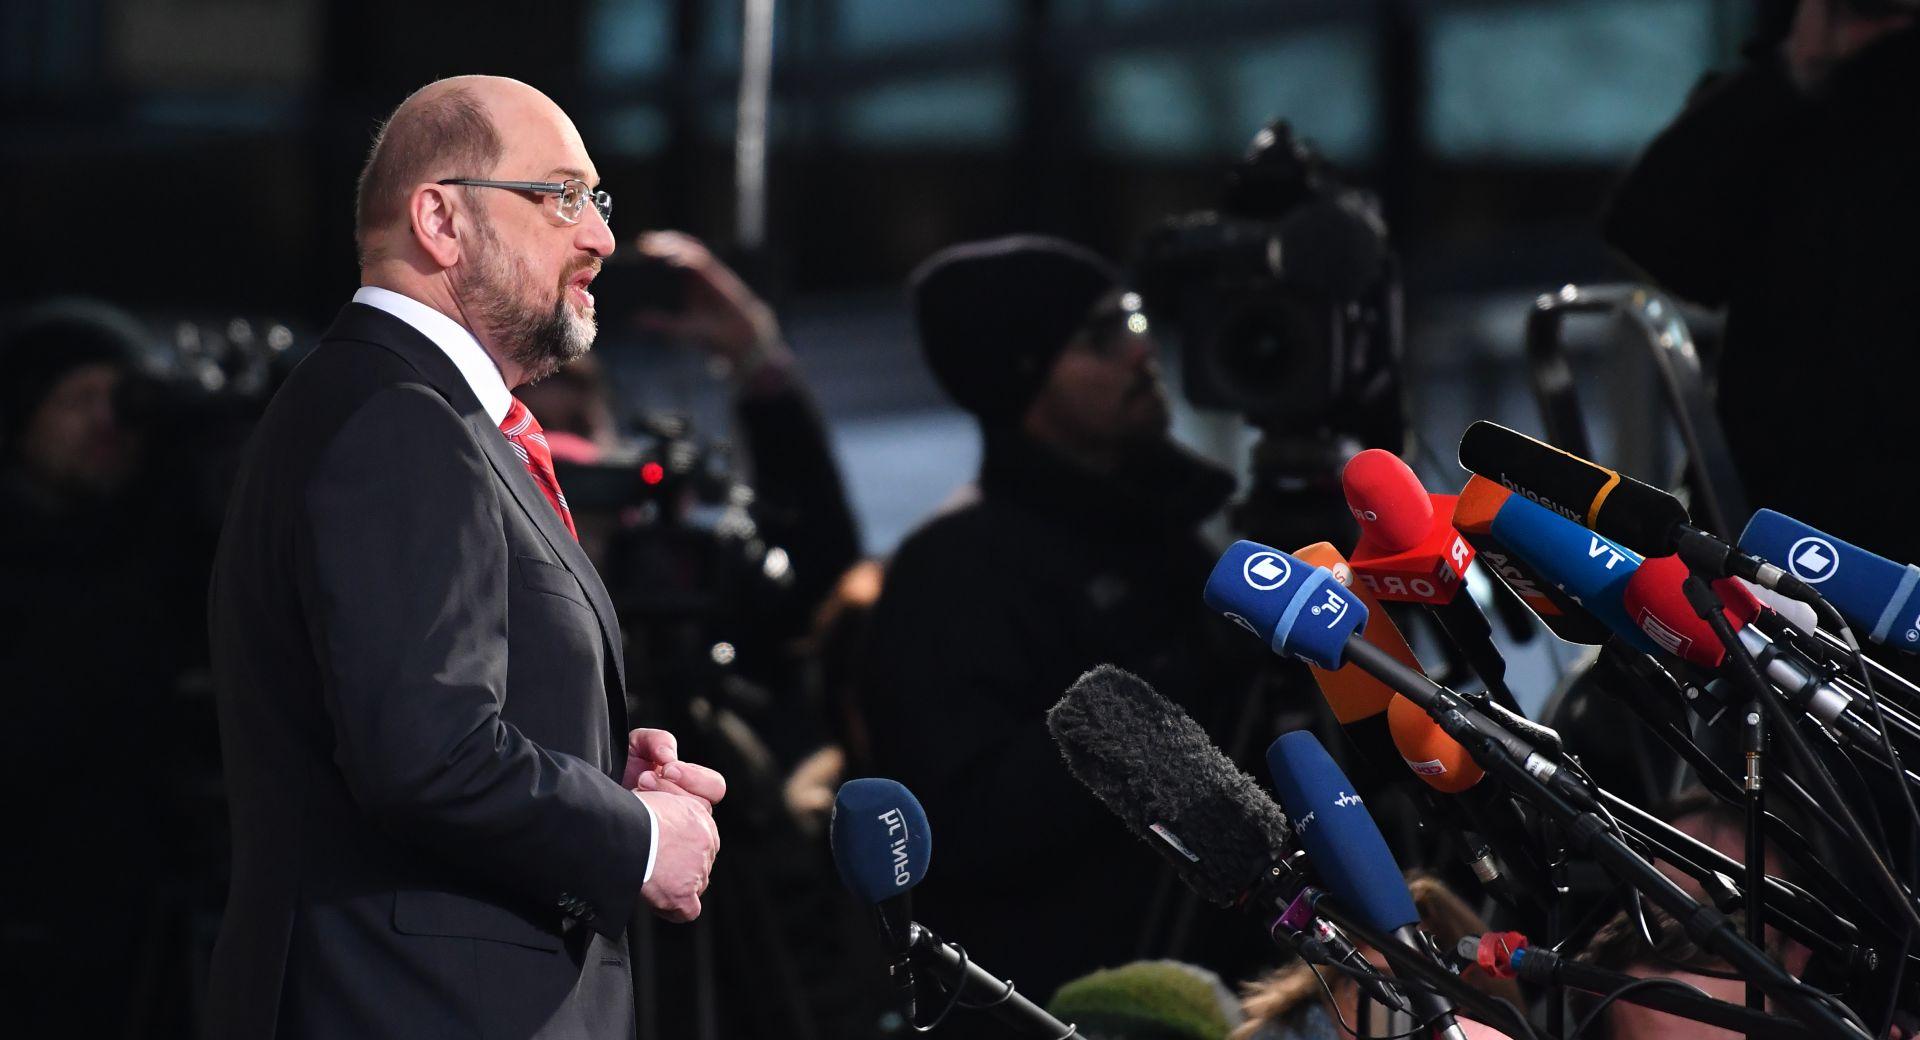 Njemački demokršćani i socijaldemokrati zadovoljni početkom pregovor